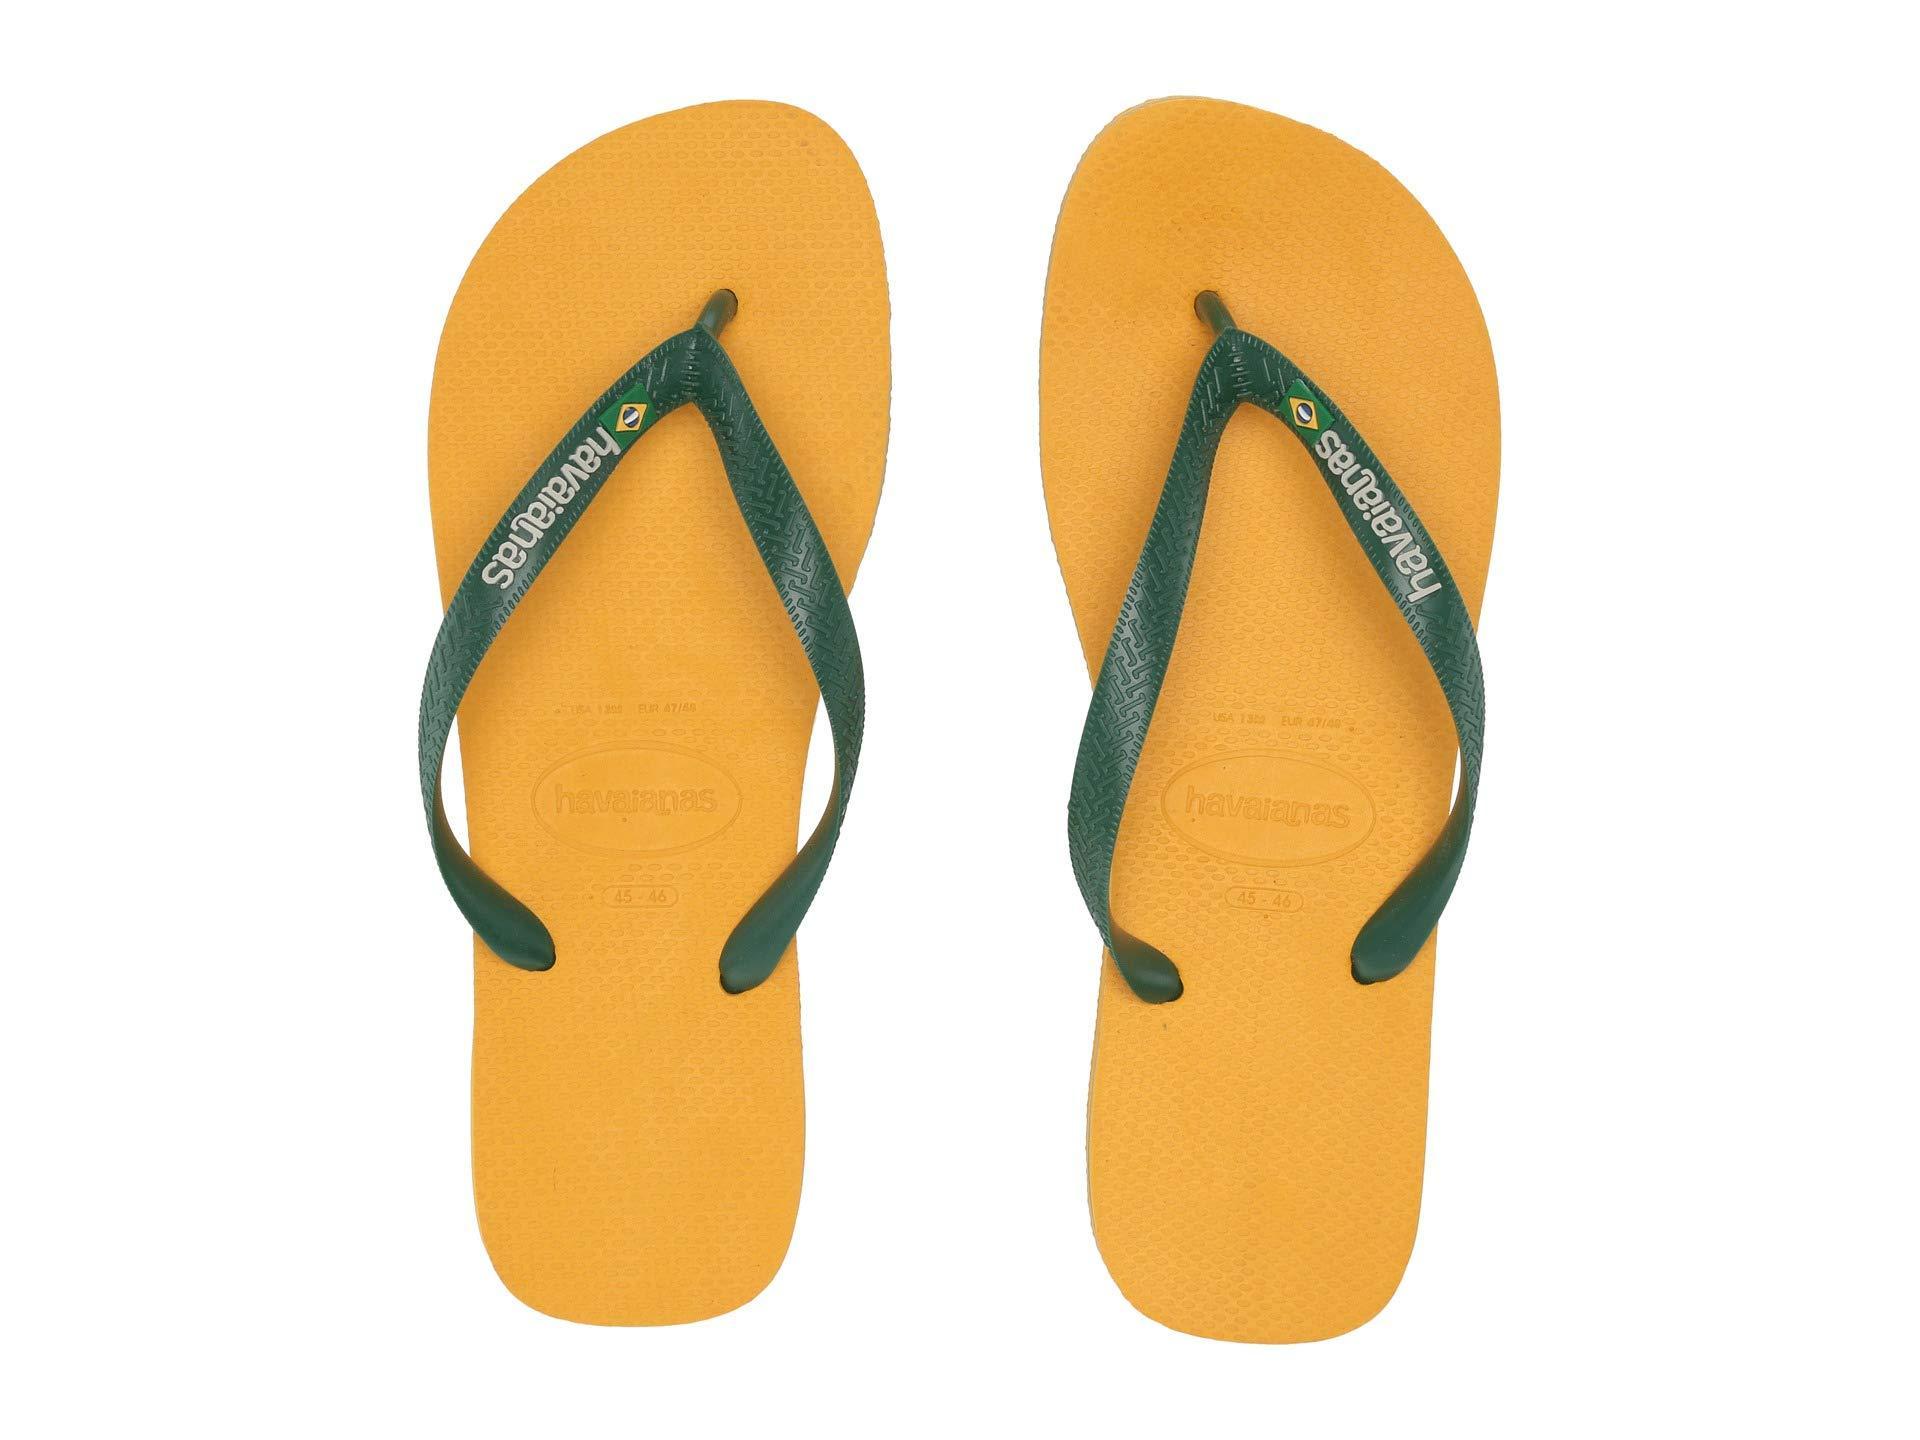 51816c7ecdfd2c Havaianas - Brazil Logo Flip Flops (banana Yellow) Men s Sandals for Men -  Lyst. View fullscreen